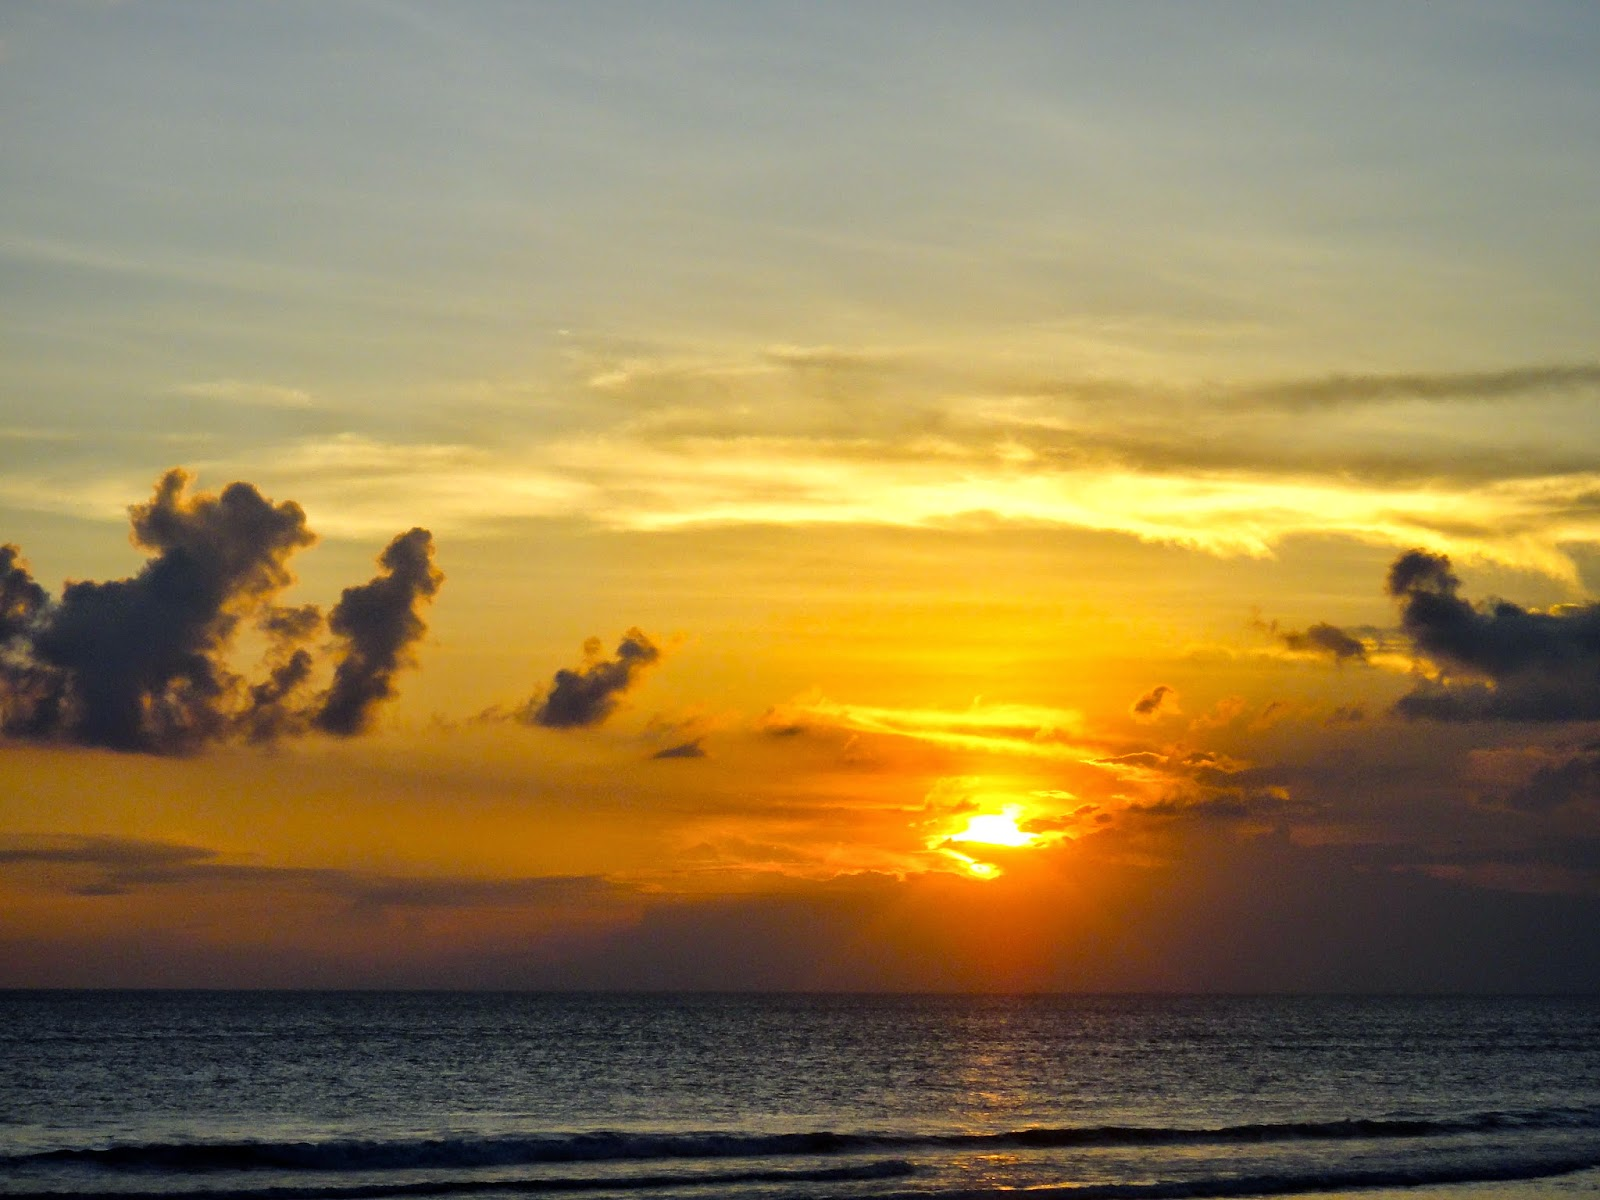 Sunset at Ku De Ta Seminyak Bali Indonesia